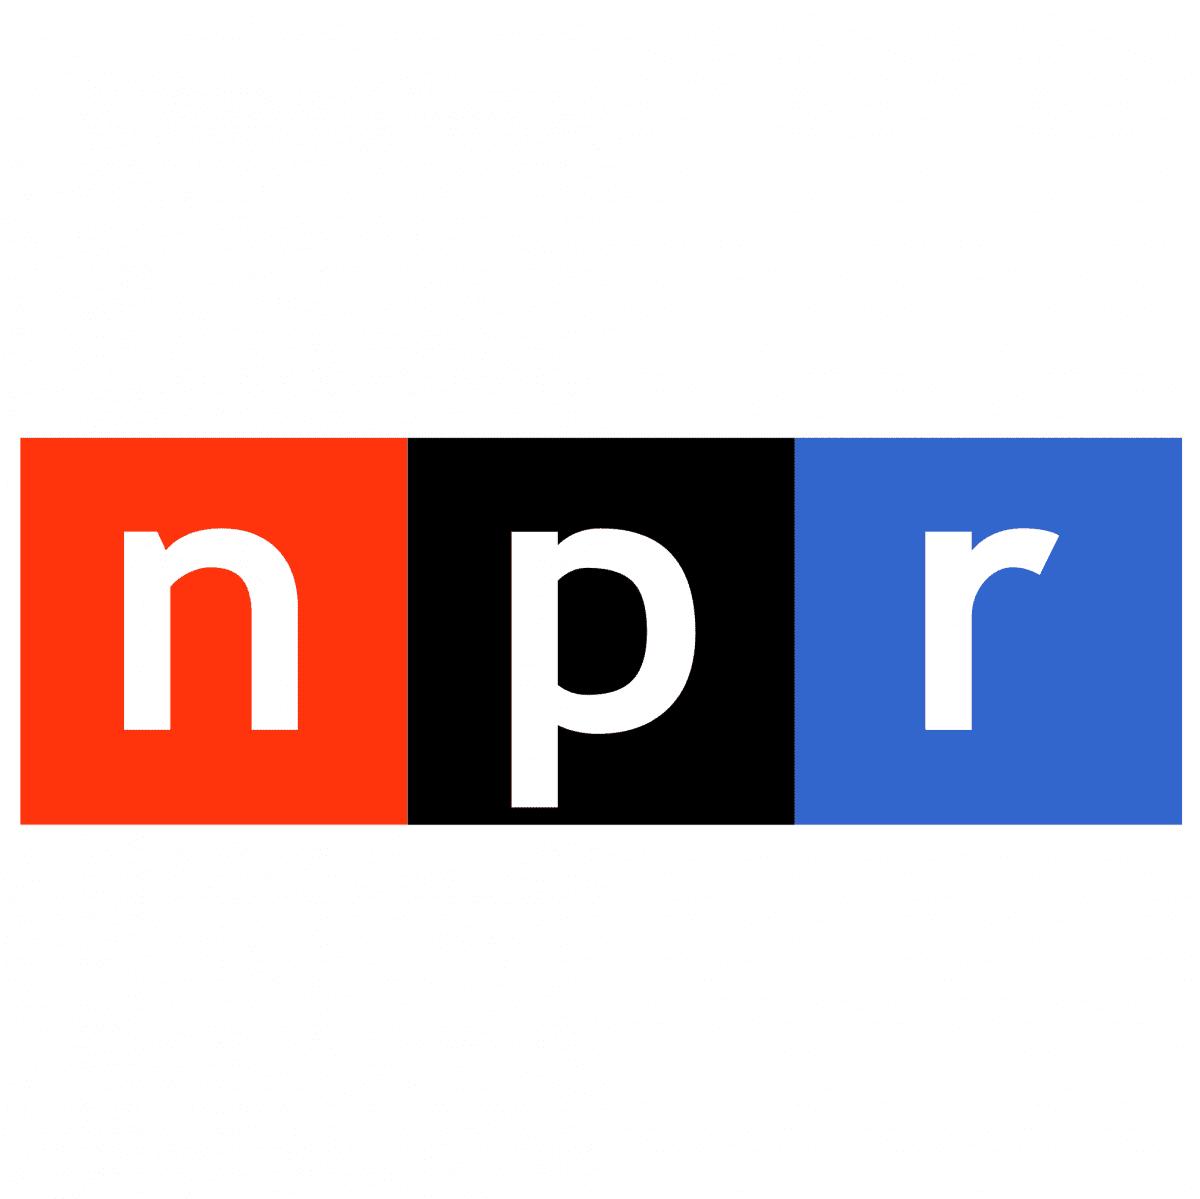 Susan Winter featured on NPR